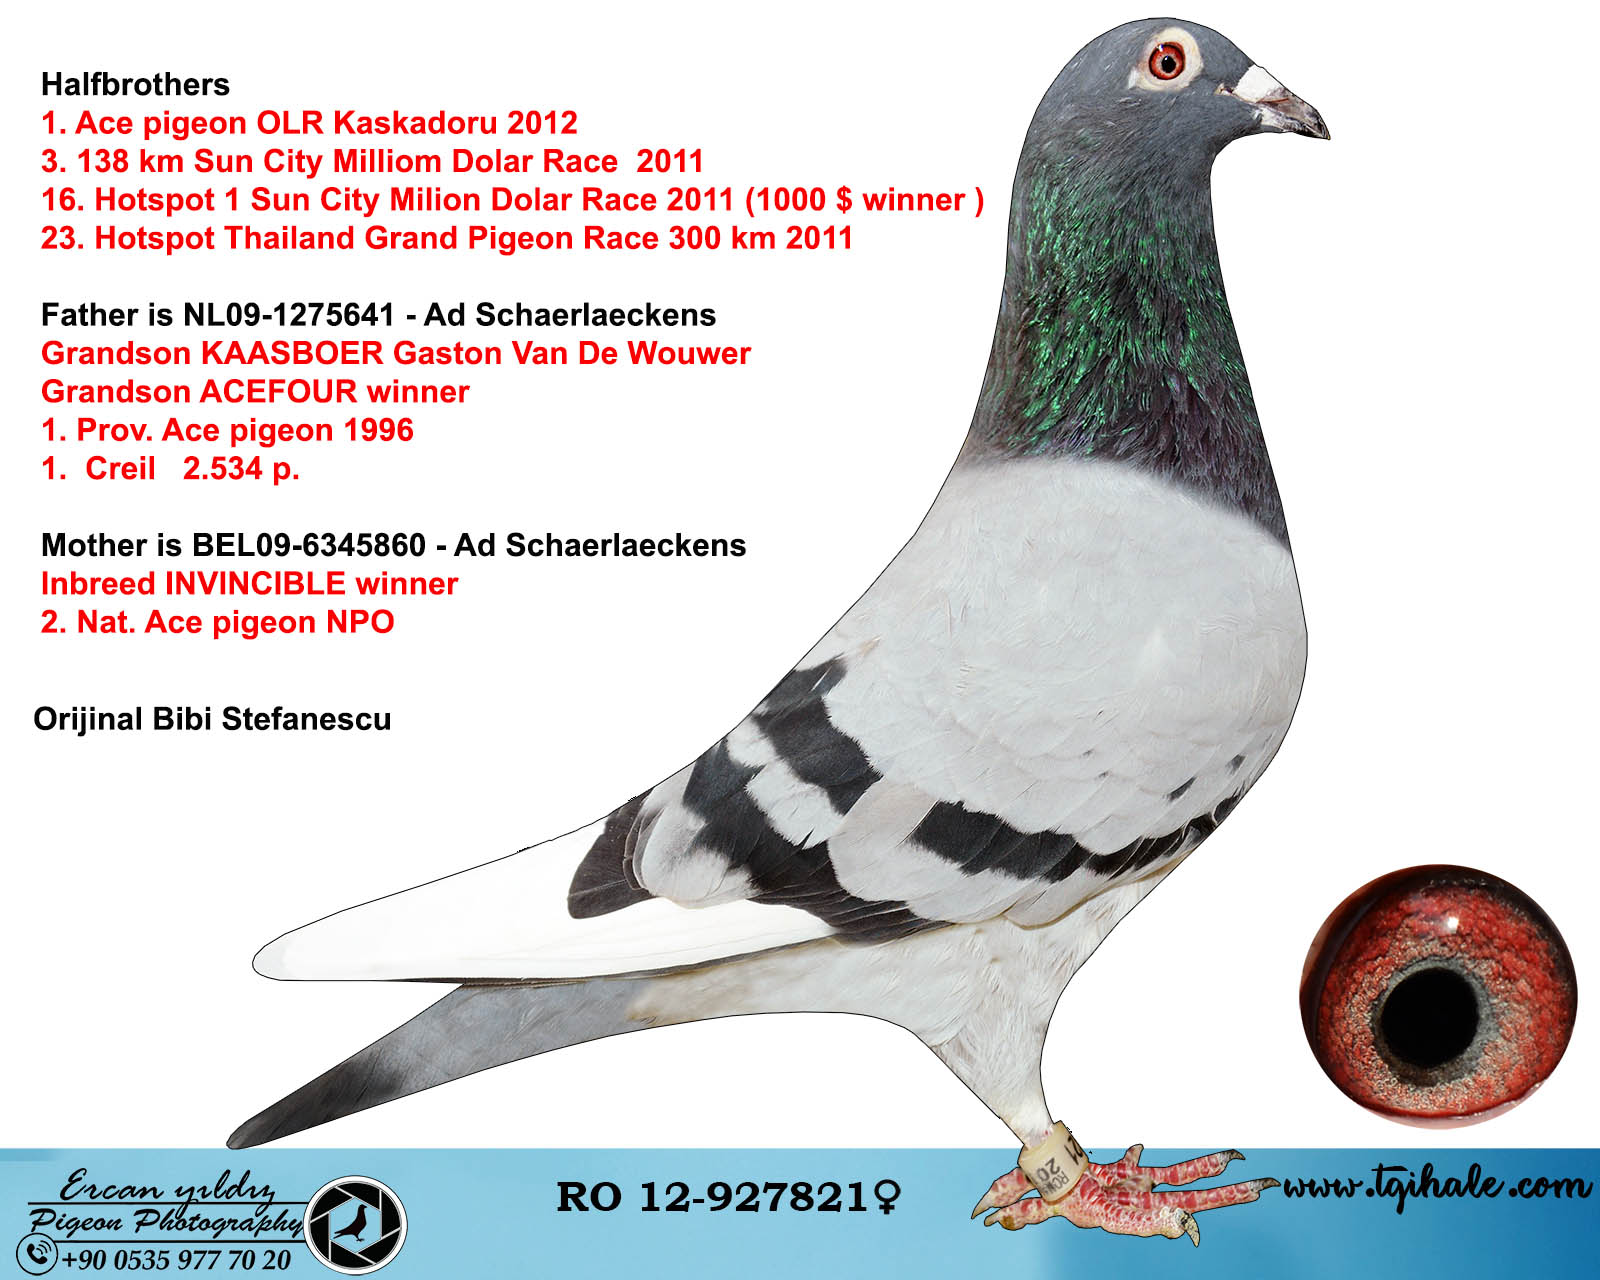 RO12-927821 DİŞİ / AD SCHAERLAECKENS % 100 BABADAN KARDEŞ 1 ACE PİGEON OLR